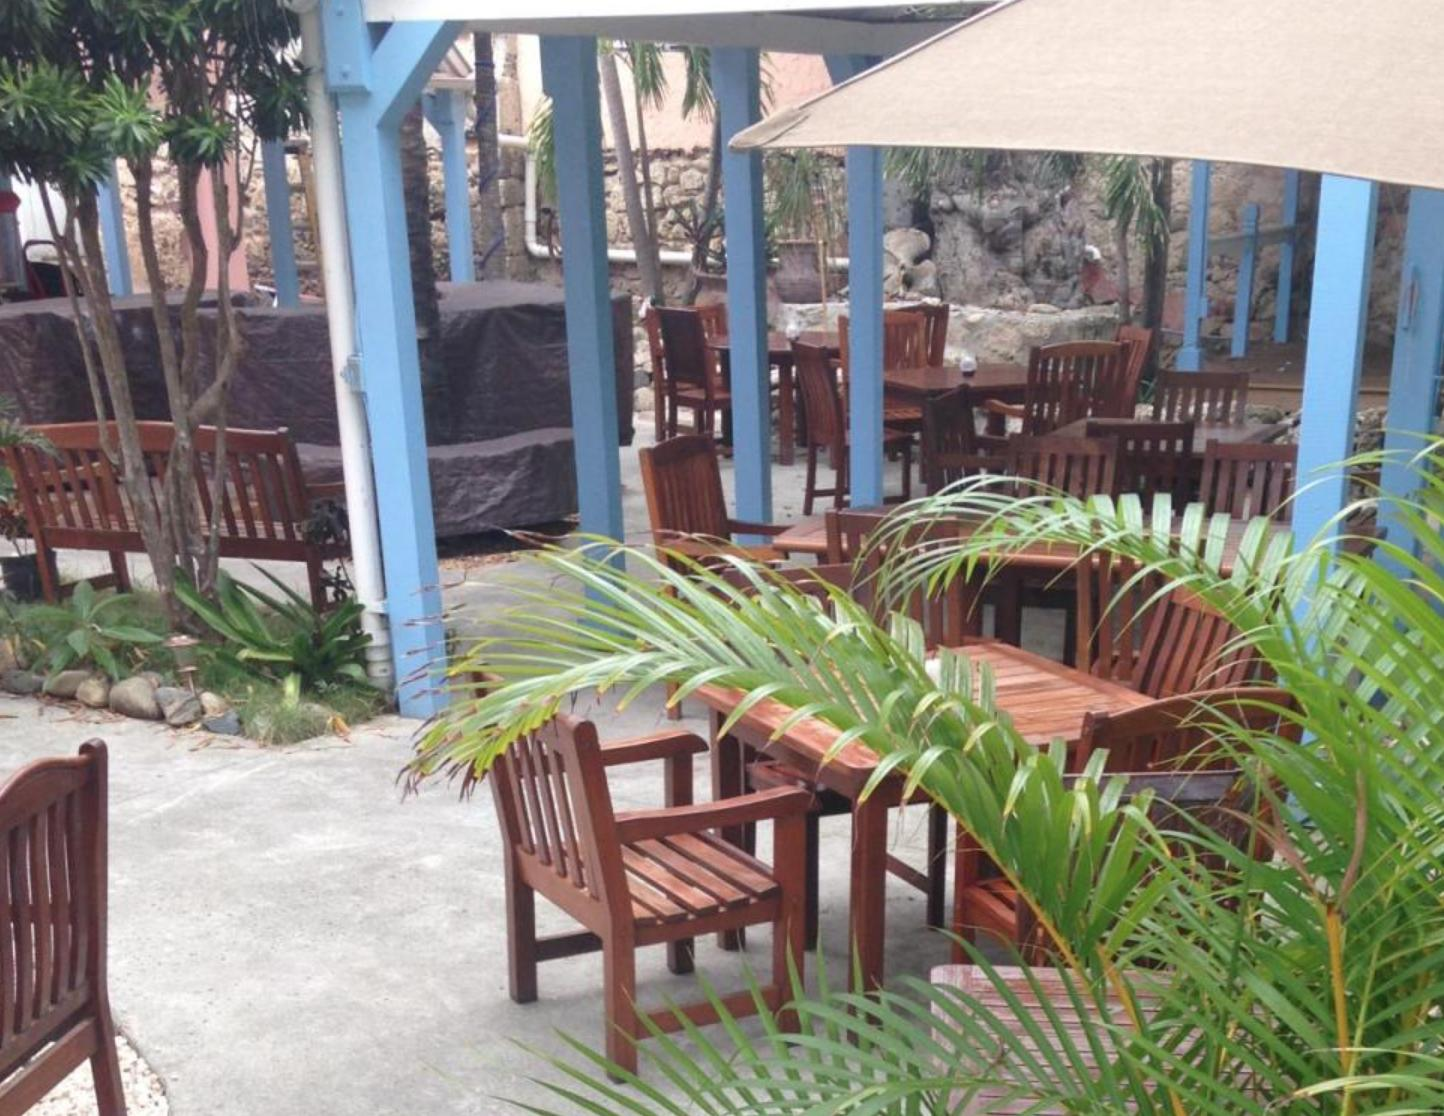 furnished Court Yard